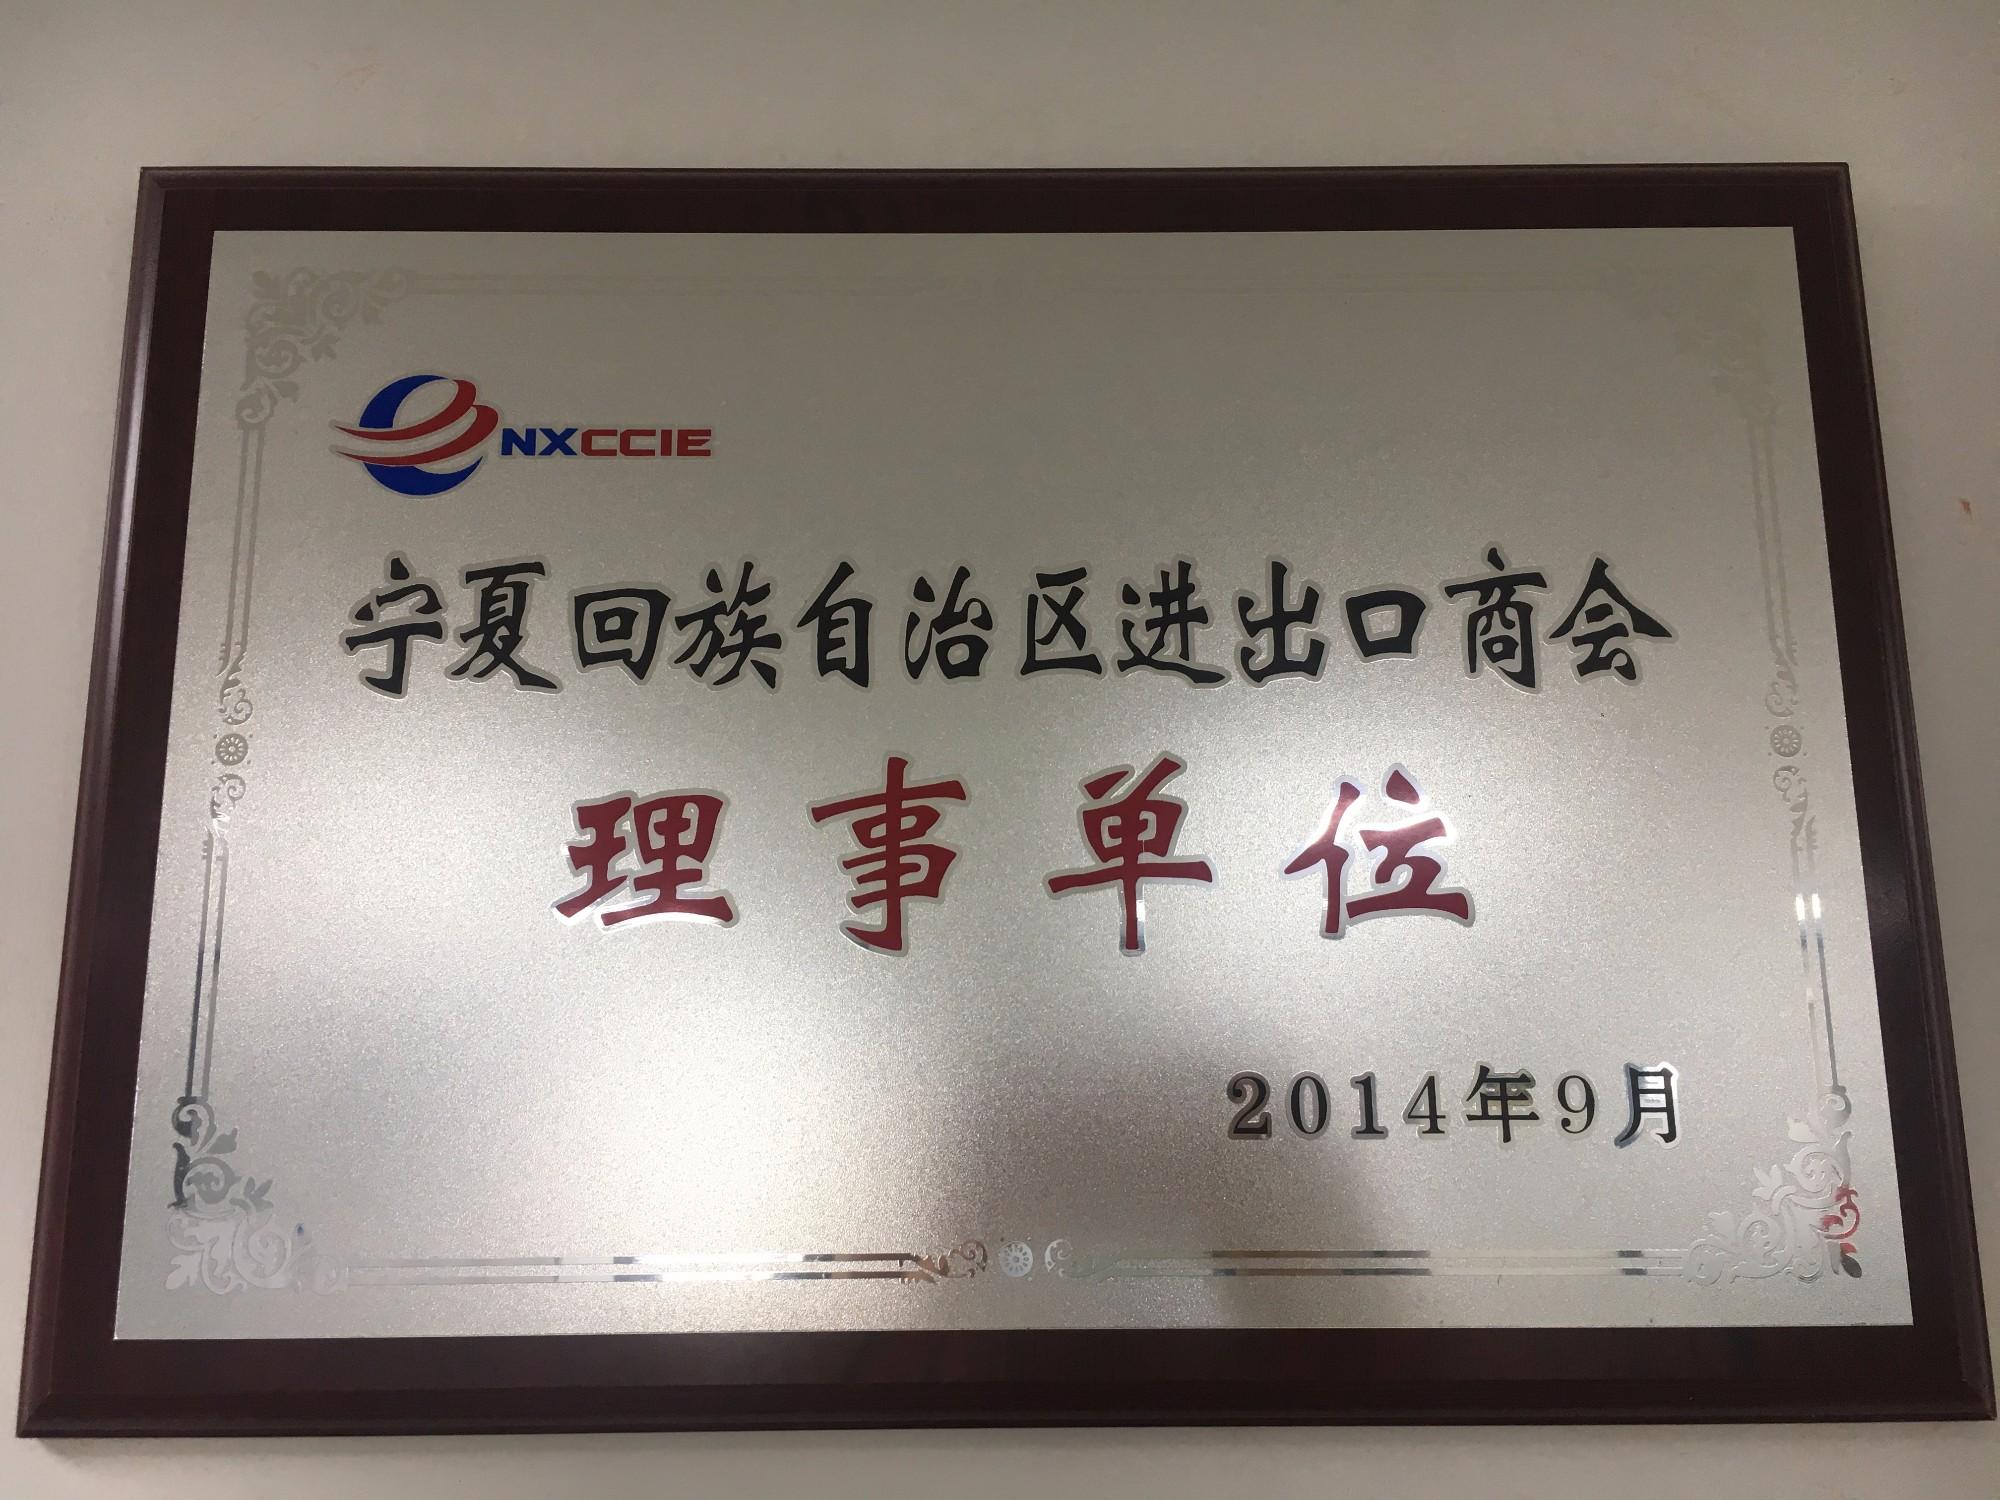 Member of ningxia hui autonomous region import and export chamber of commerce